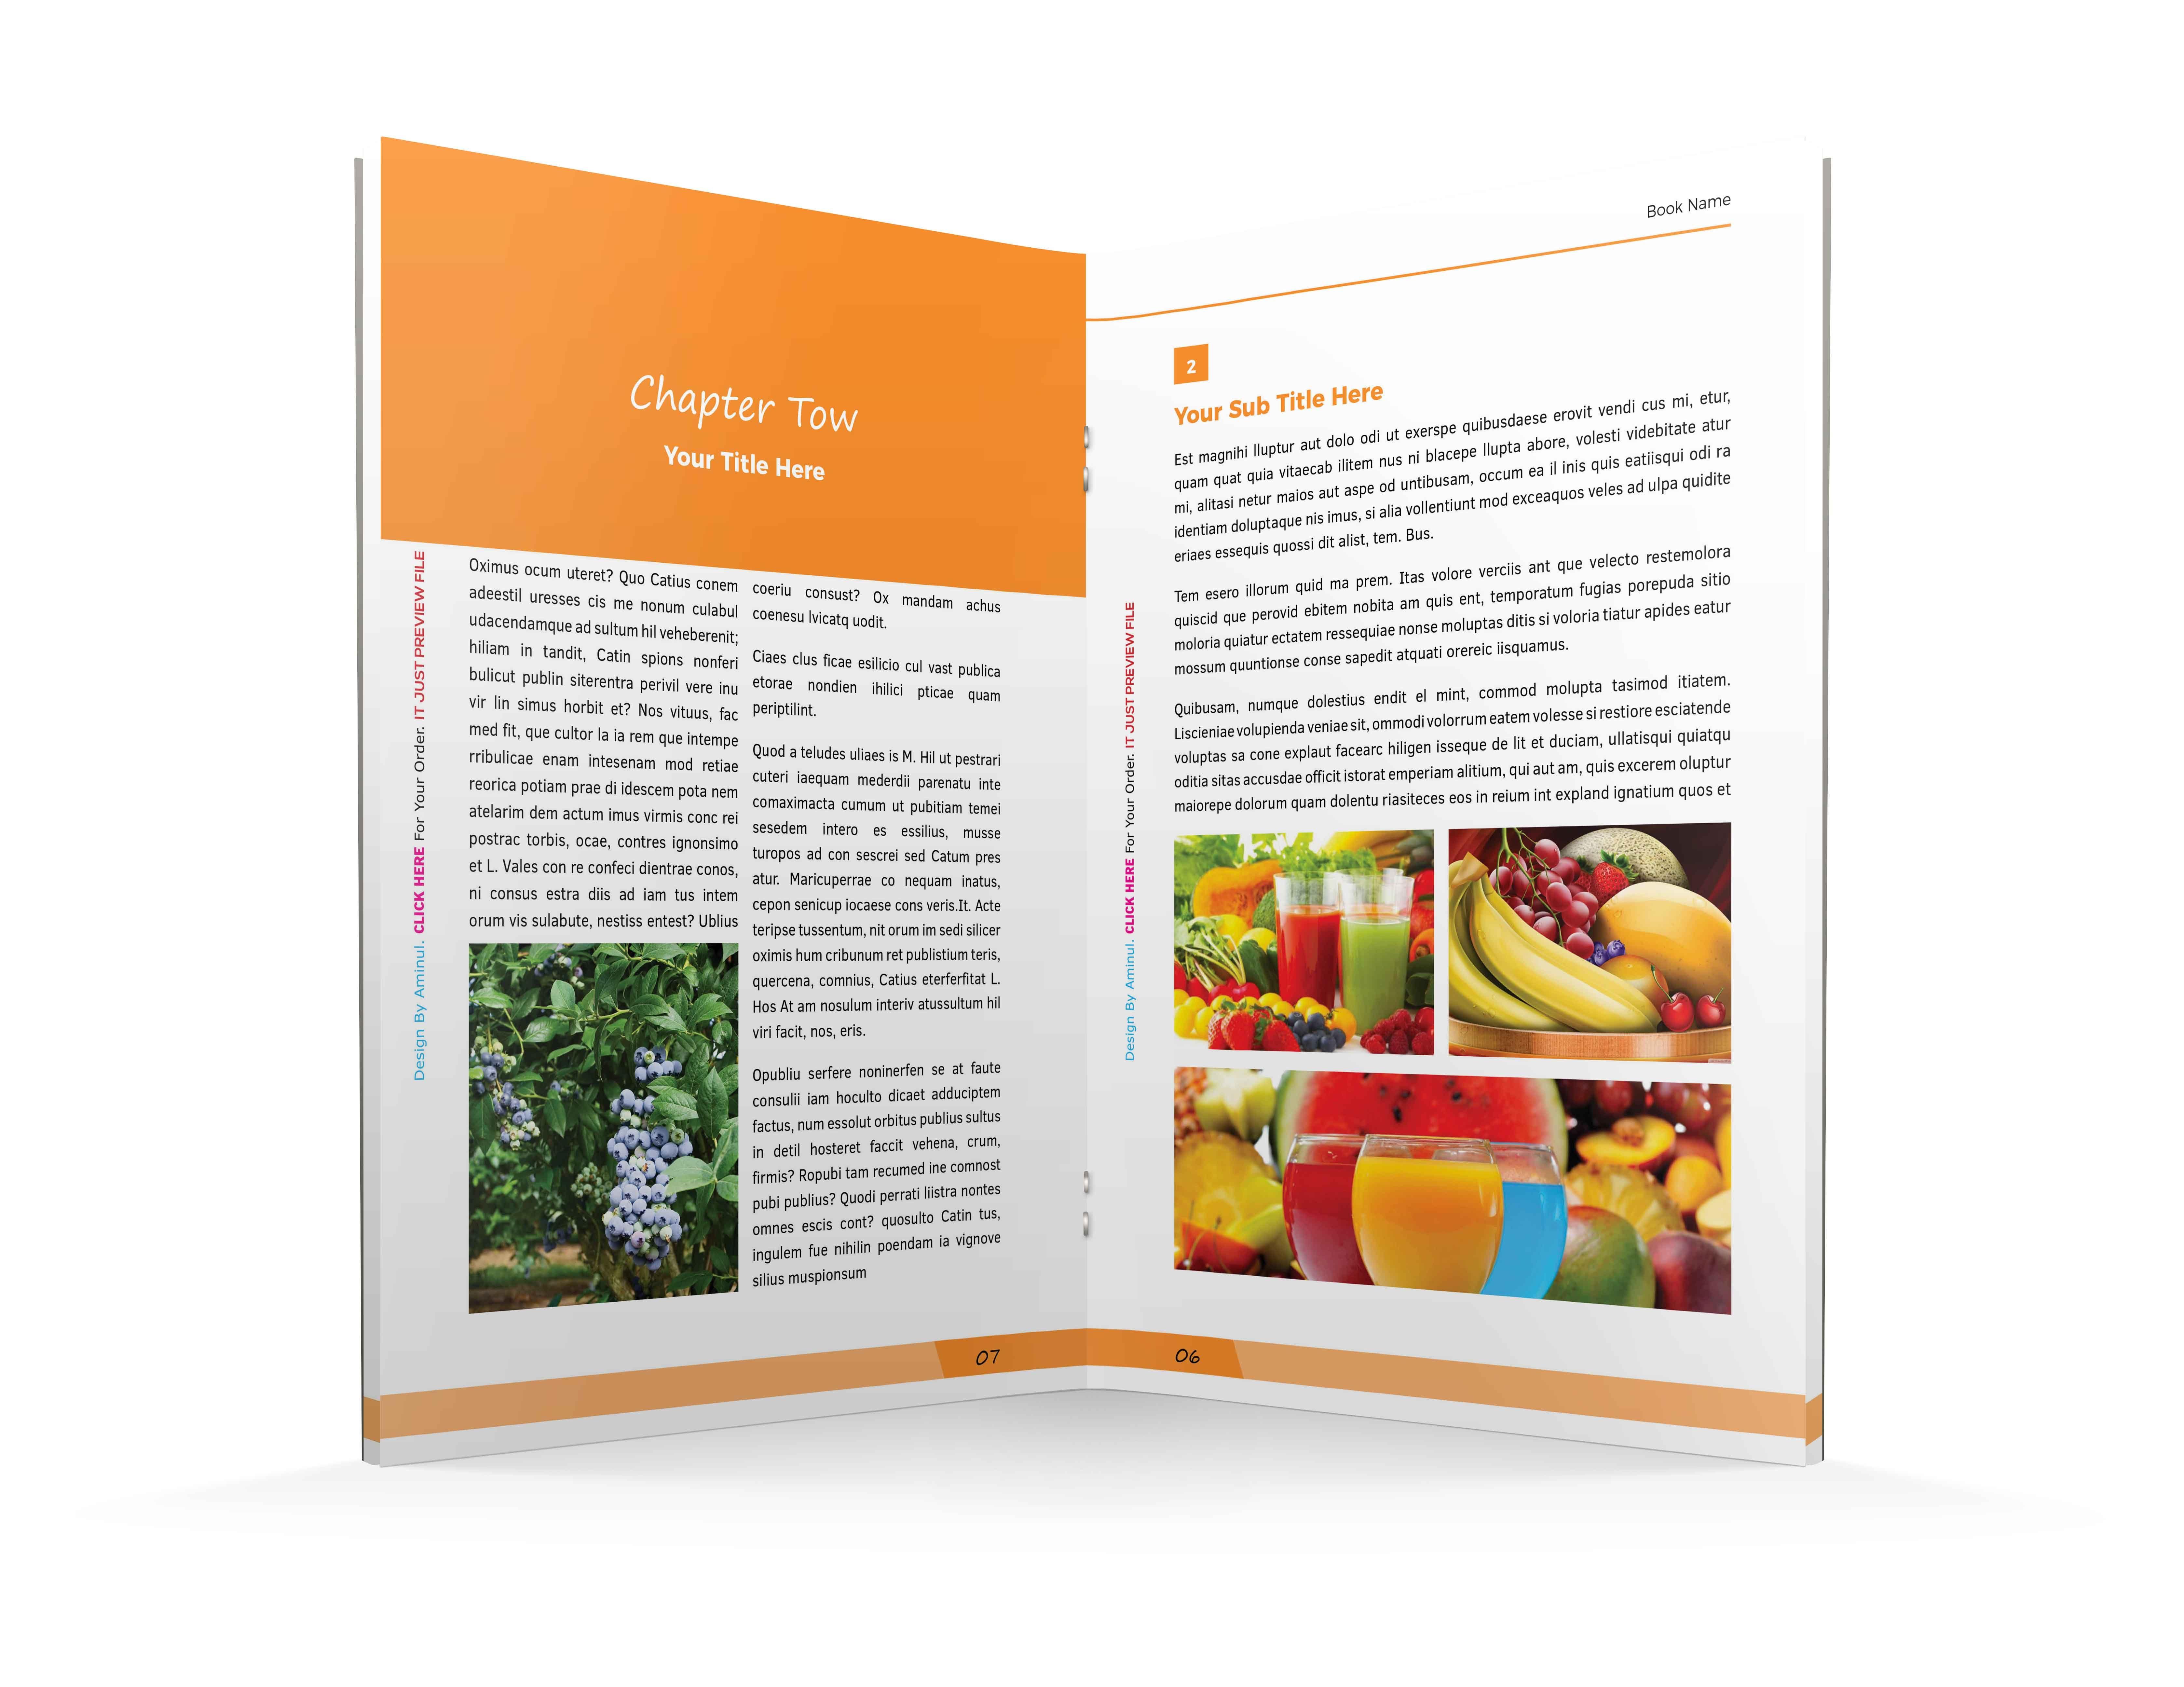 aminulv I will design pdf ebook interior layout design with cover